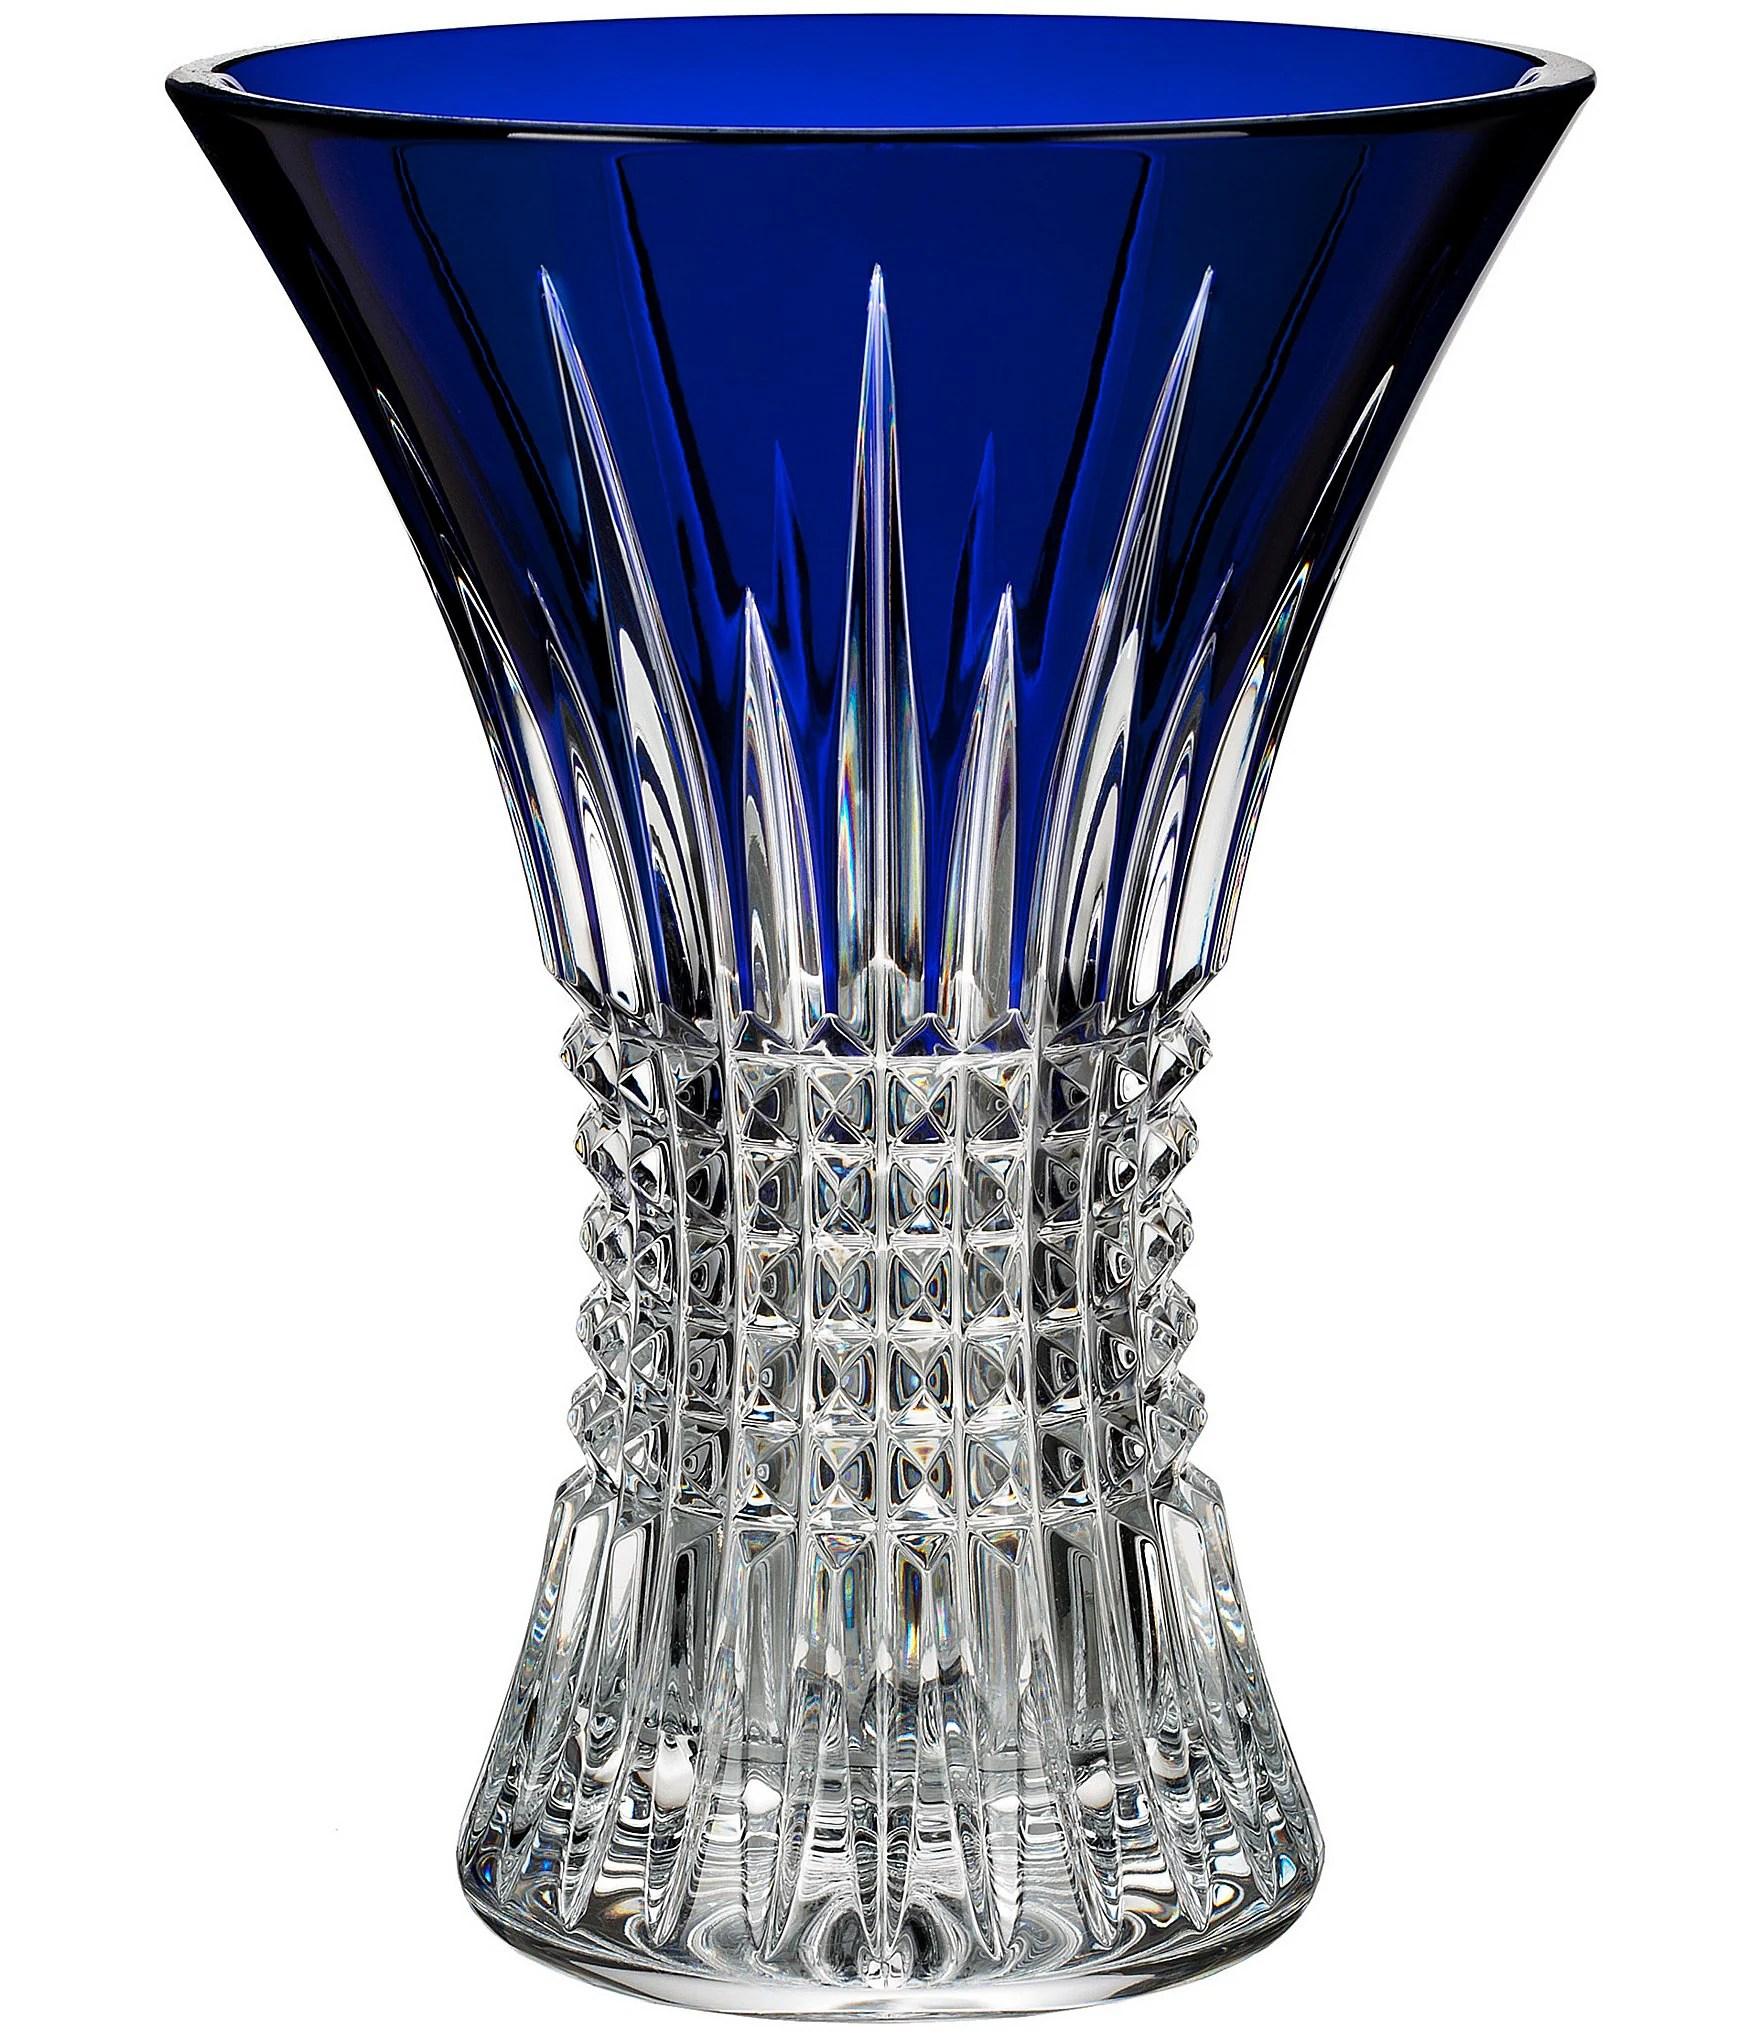 Waterford Lismore Diamond Crystal Vase Dillards